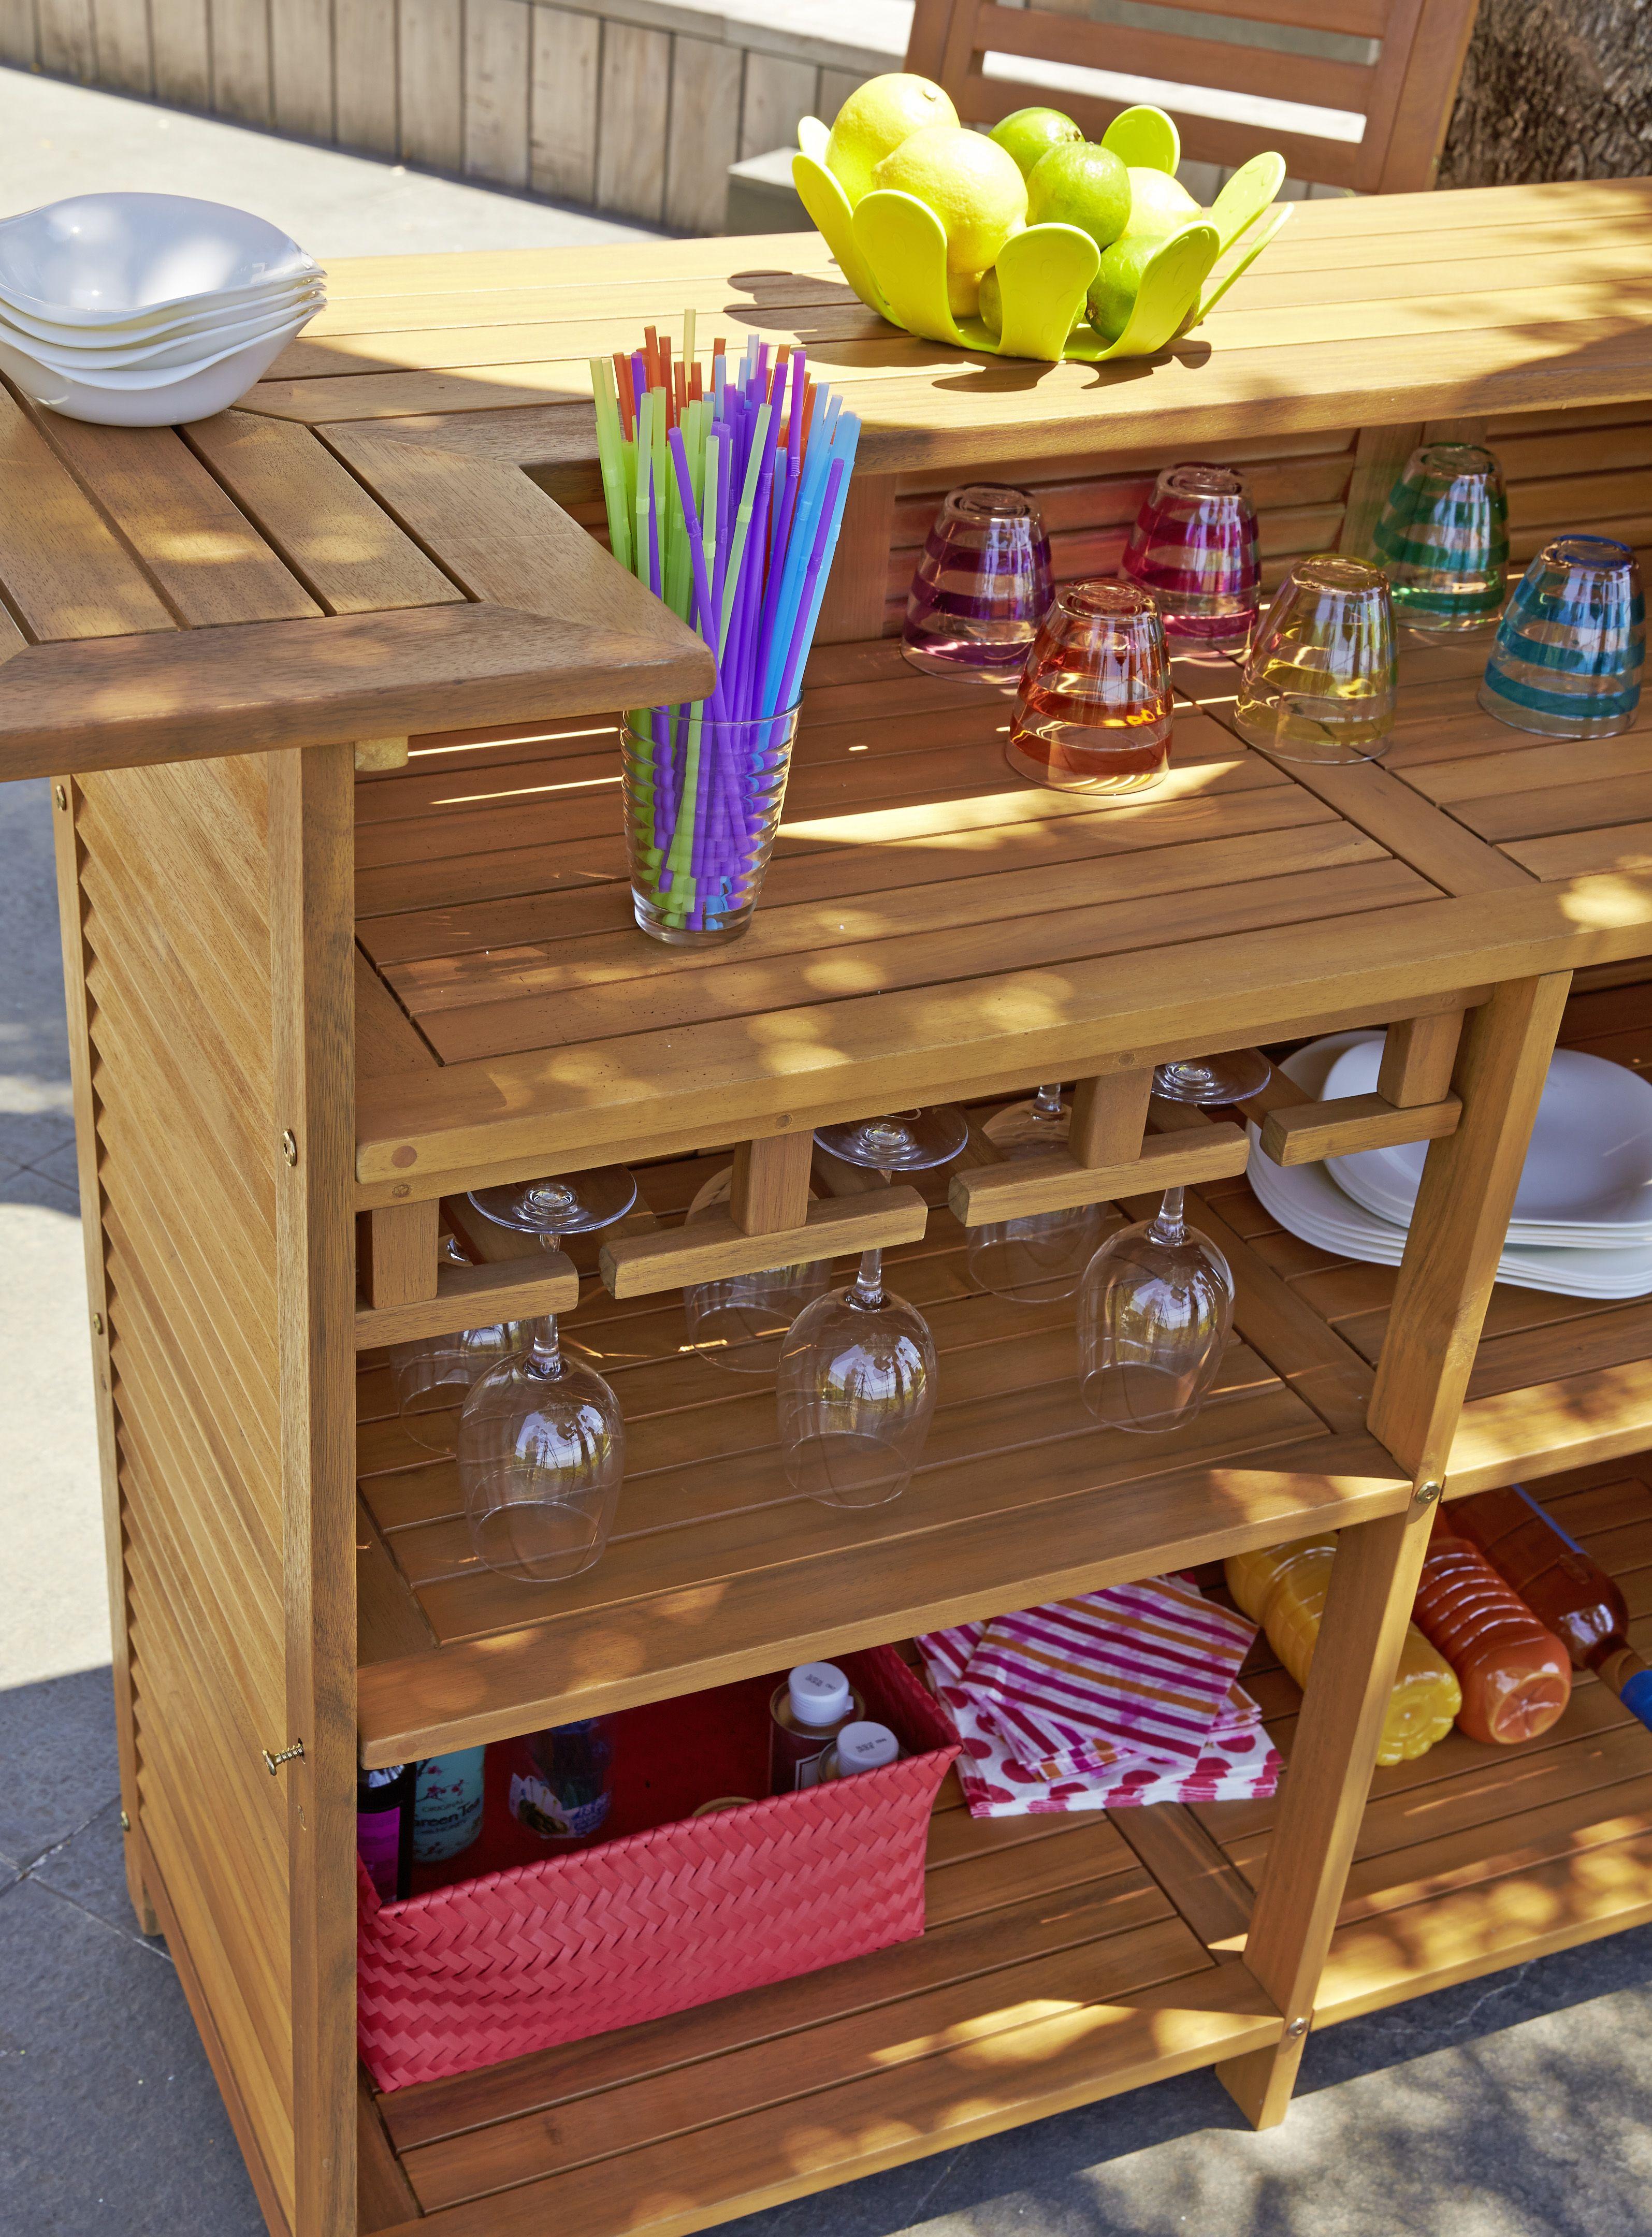 bar en acacia massif finition teint et huil dim 150x50x100 cm ambiances jardin. Black Bedroom Furniture Sets. Home Design Ideas